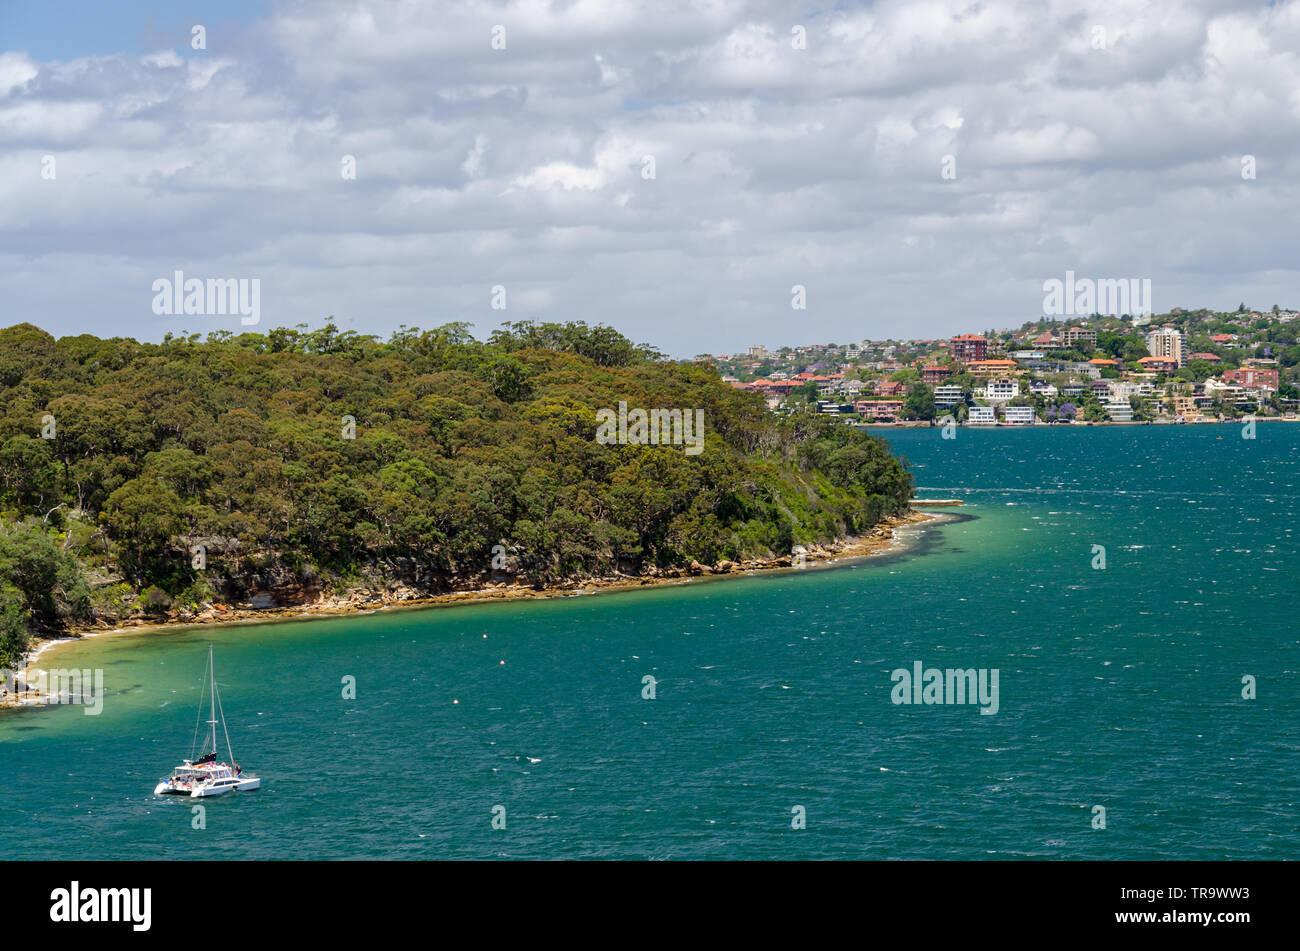 beautiful taylors bay area with a boat catamaran - Stock Image